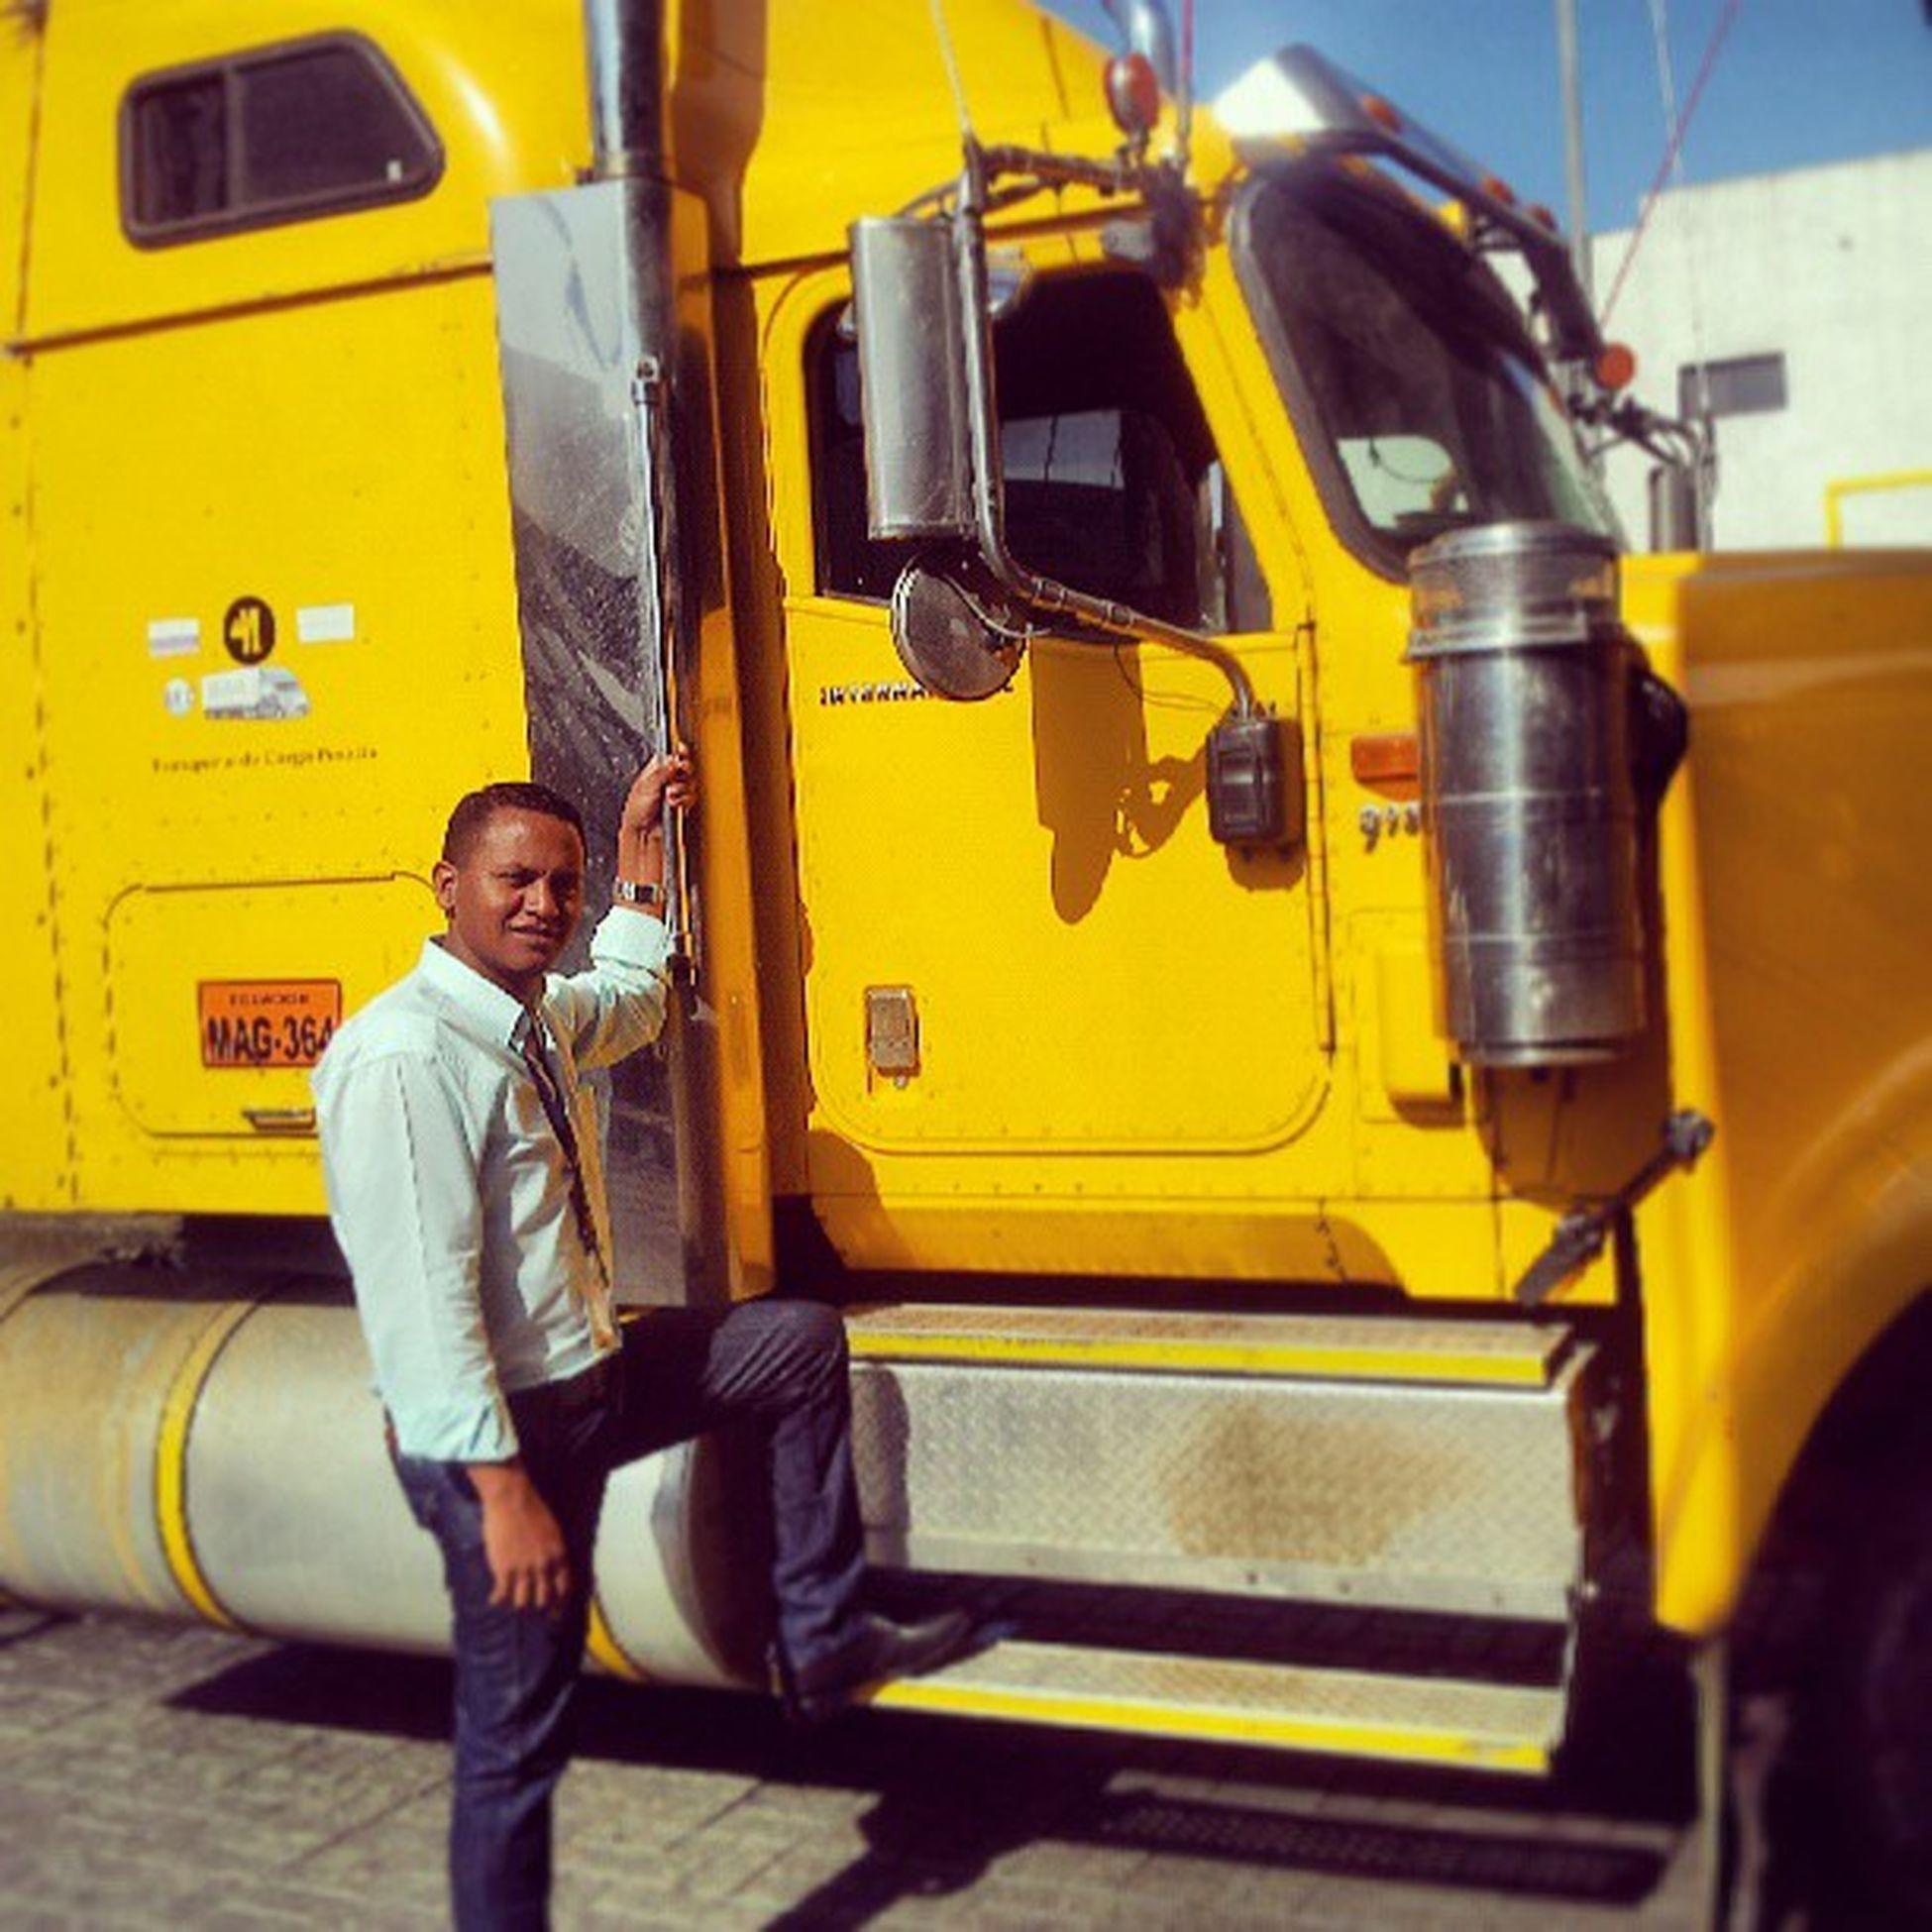 Truck Job Friday Instatruck Crazymoment lmaooo